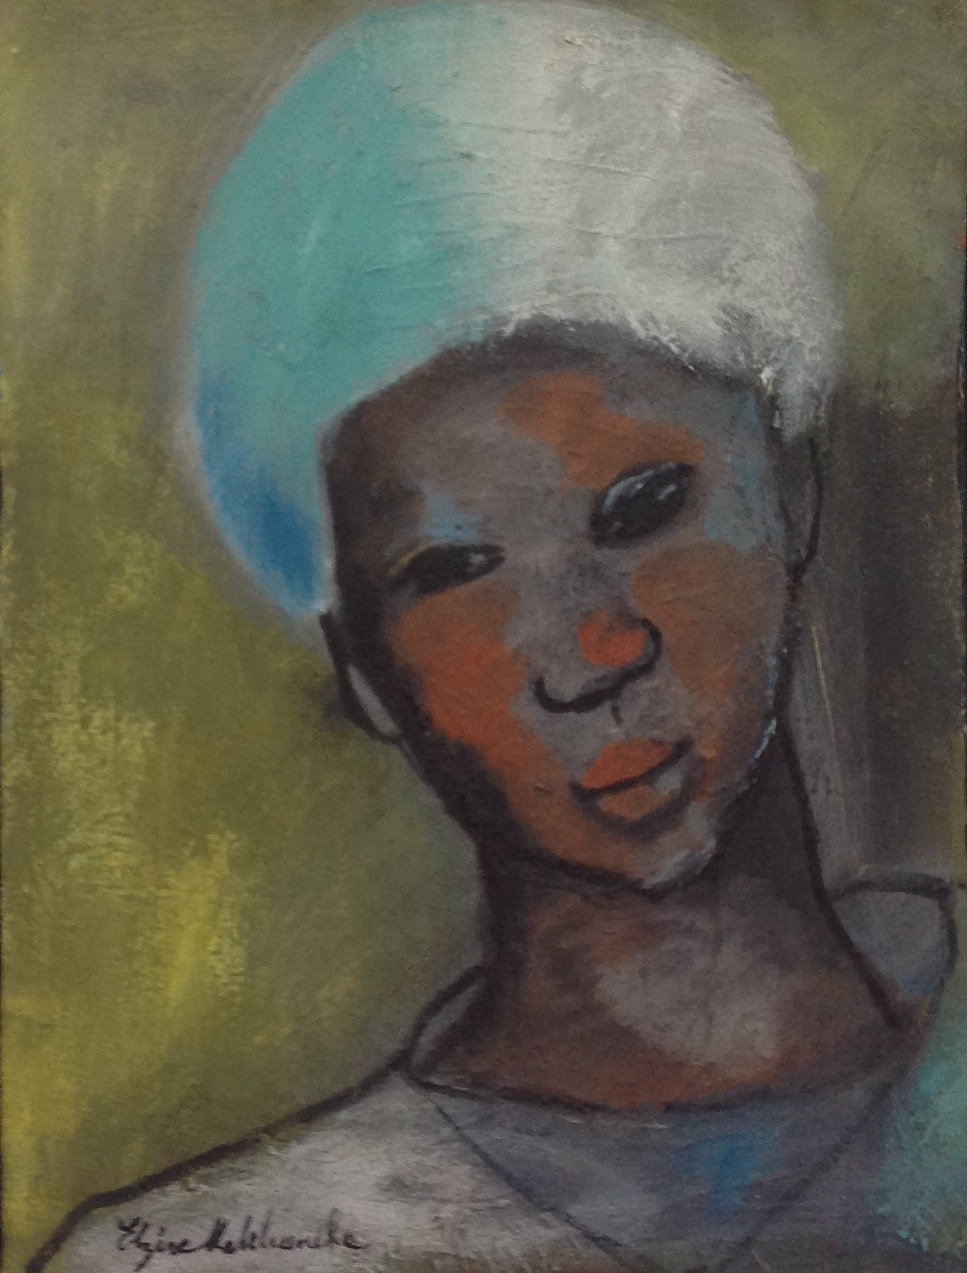 Malebranche Elzire 16X12 #18-3-96 canvas